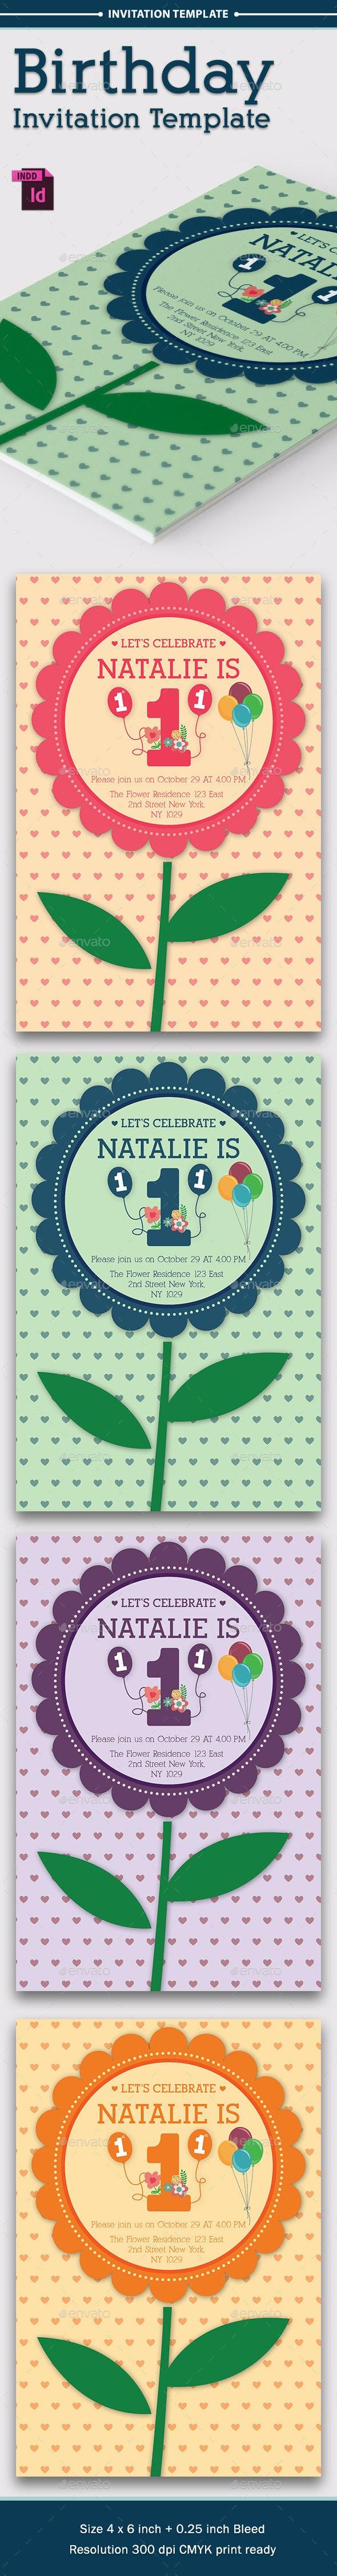 Baby Birthday Template - Vol. 3 - Cards & Invites Print Templates